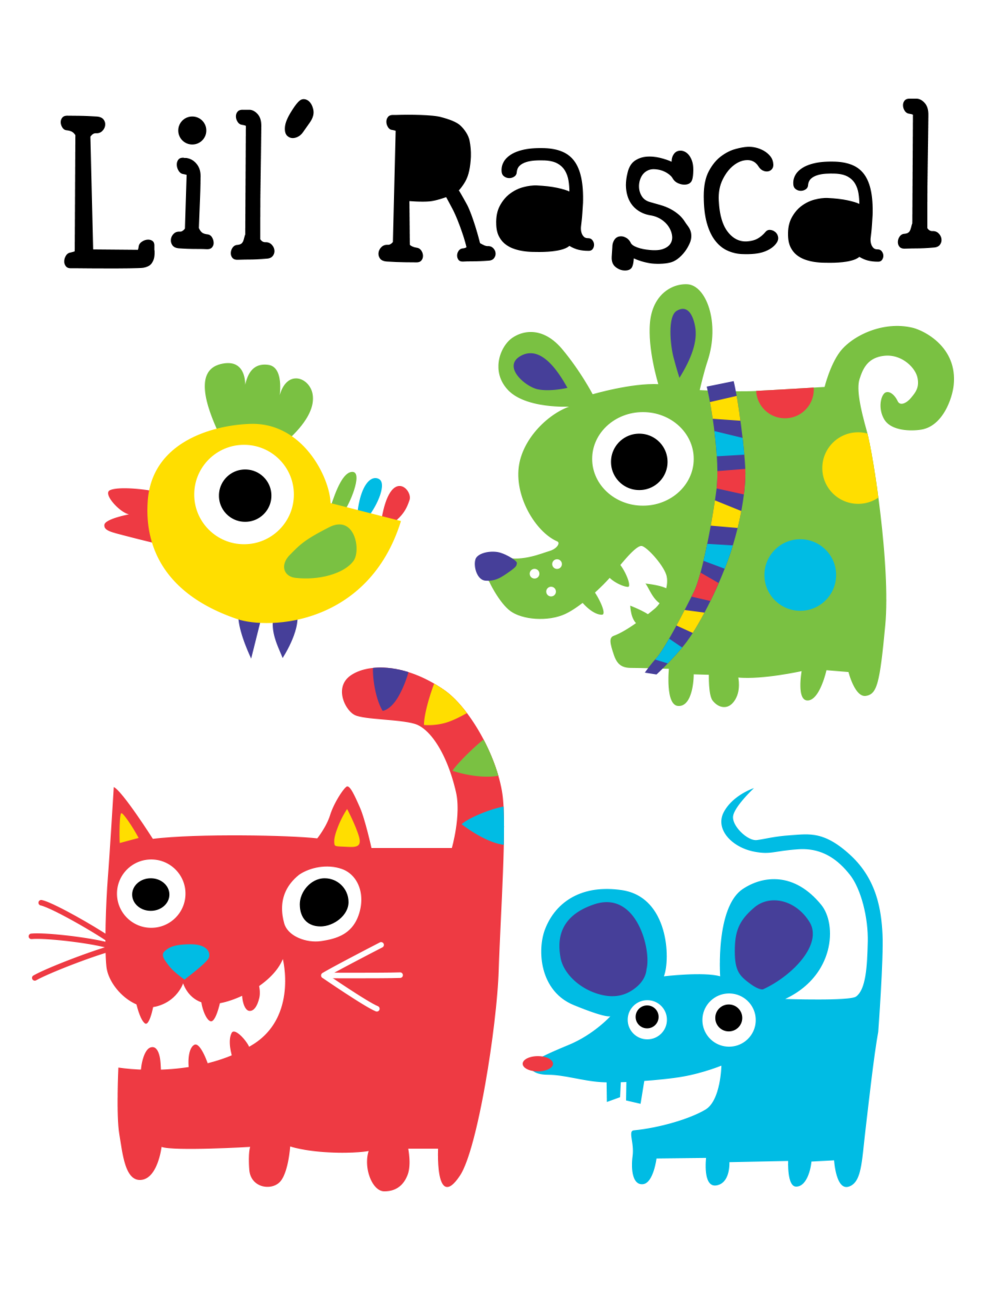 lil_rascal_andi_bird.png